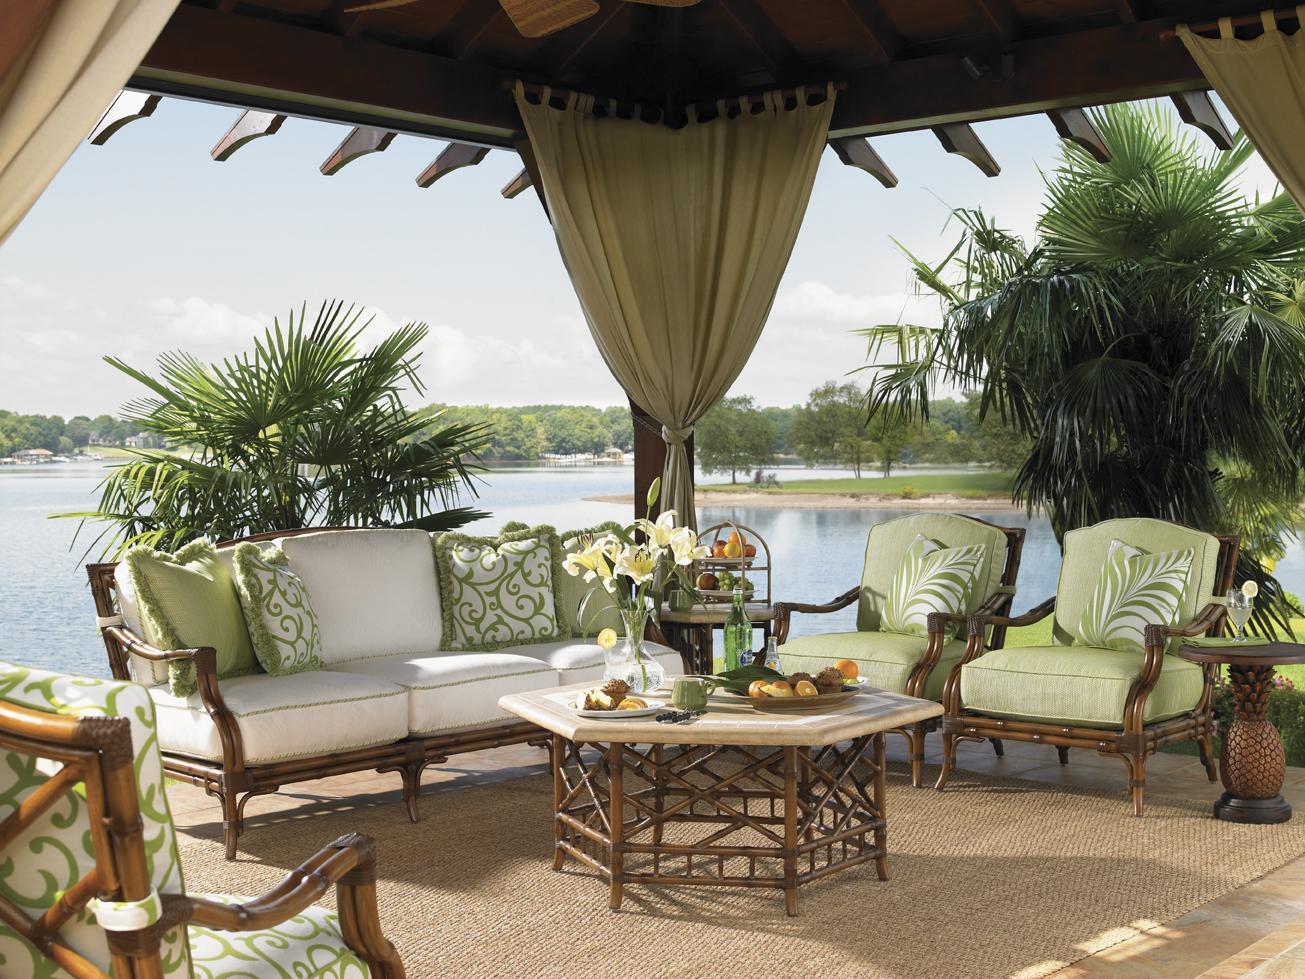 Island estate veranda 3160 by tommy bahama outdoor for Arredo veranda